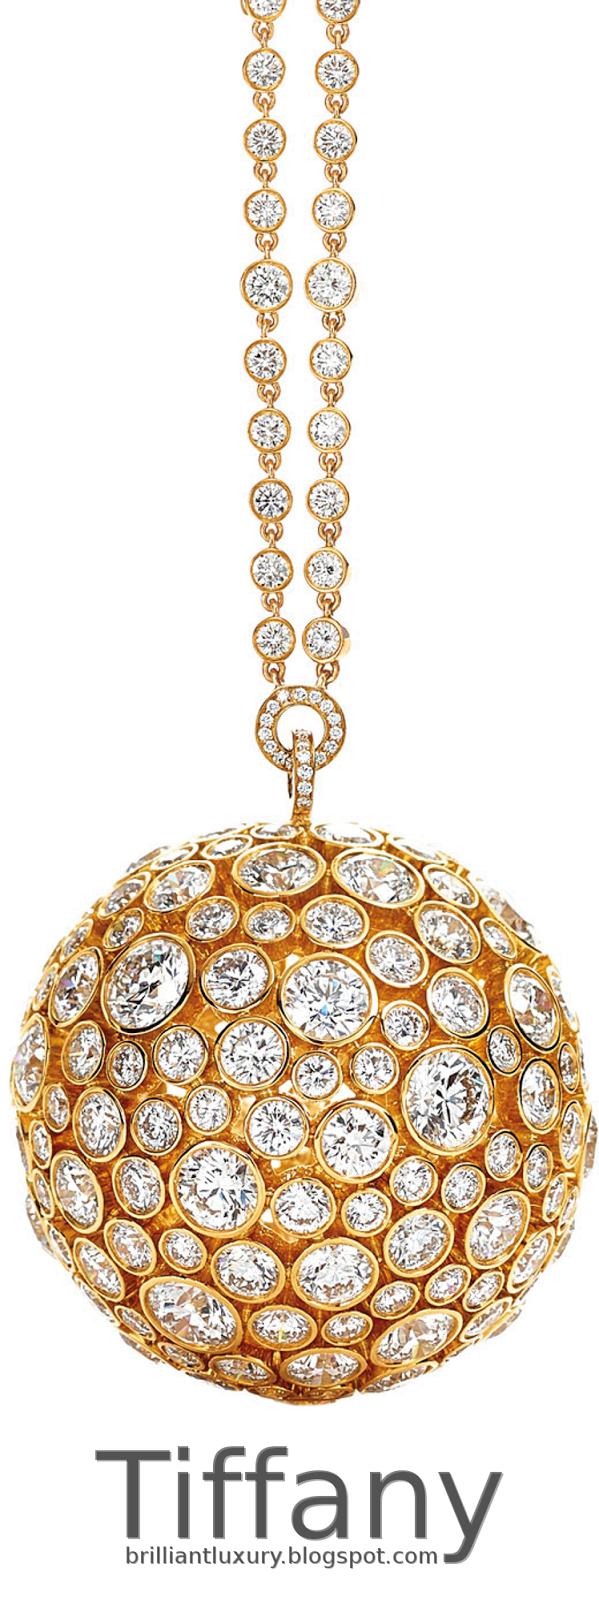 Brilliant Luxury ♦ Tiffany prism orb pendant